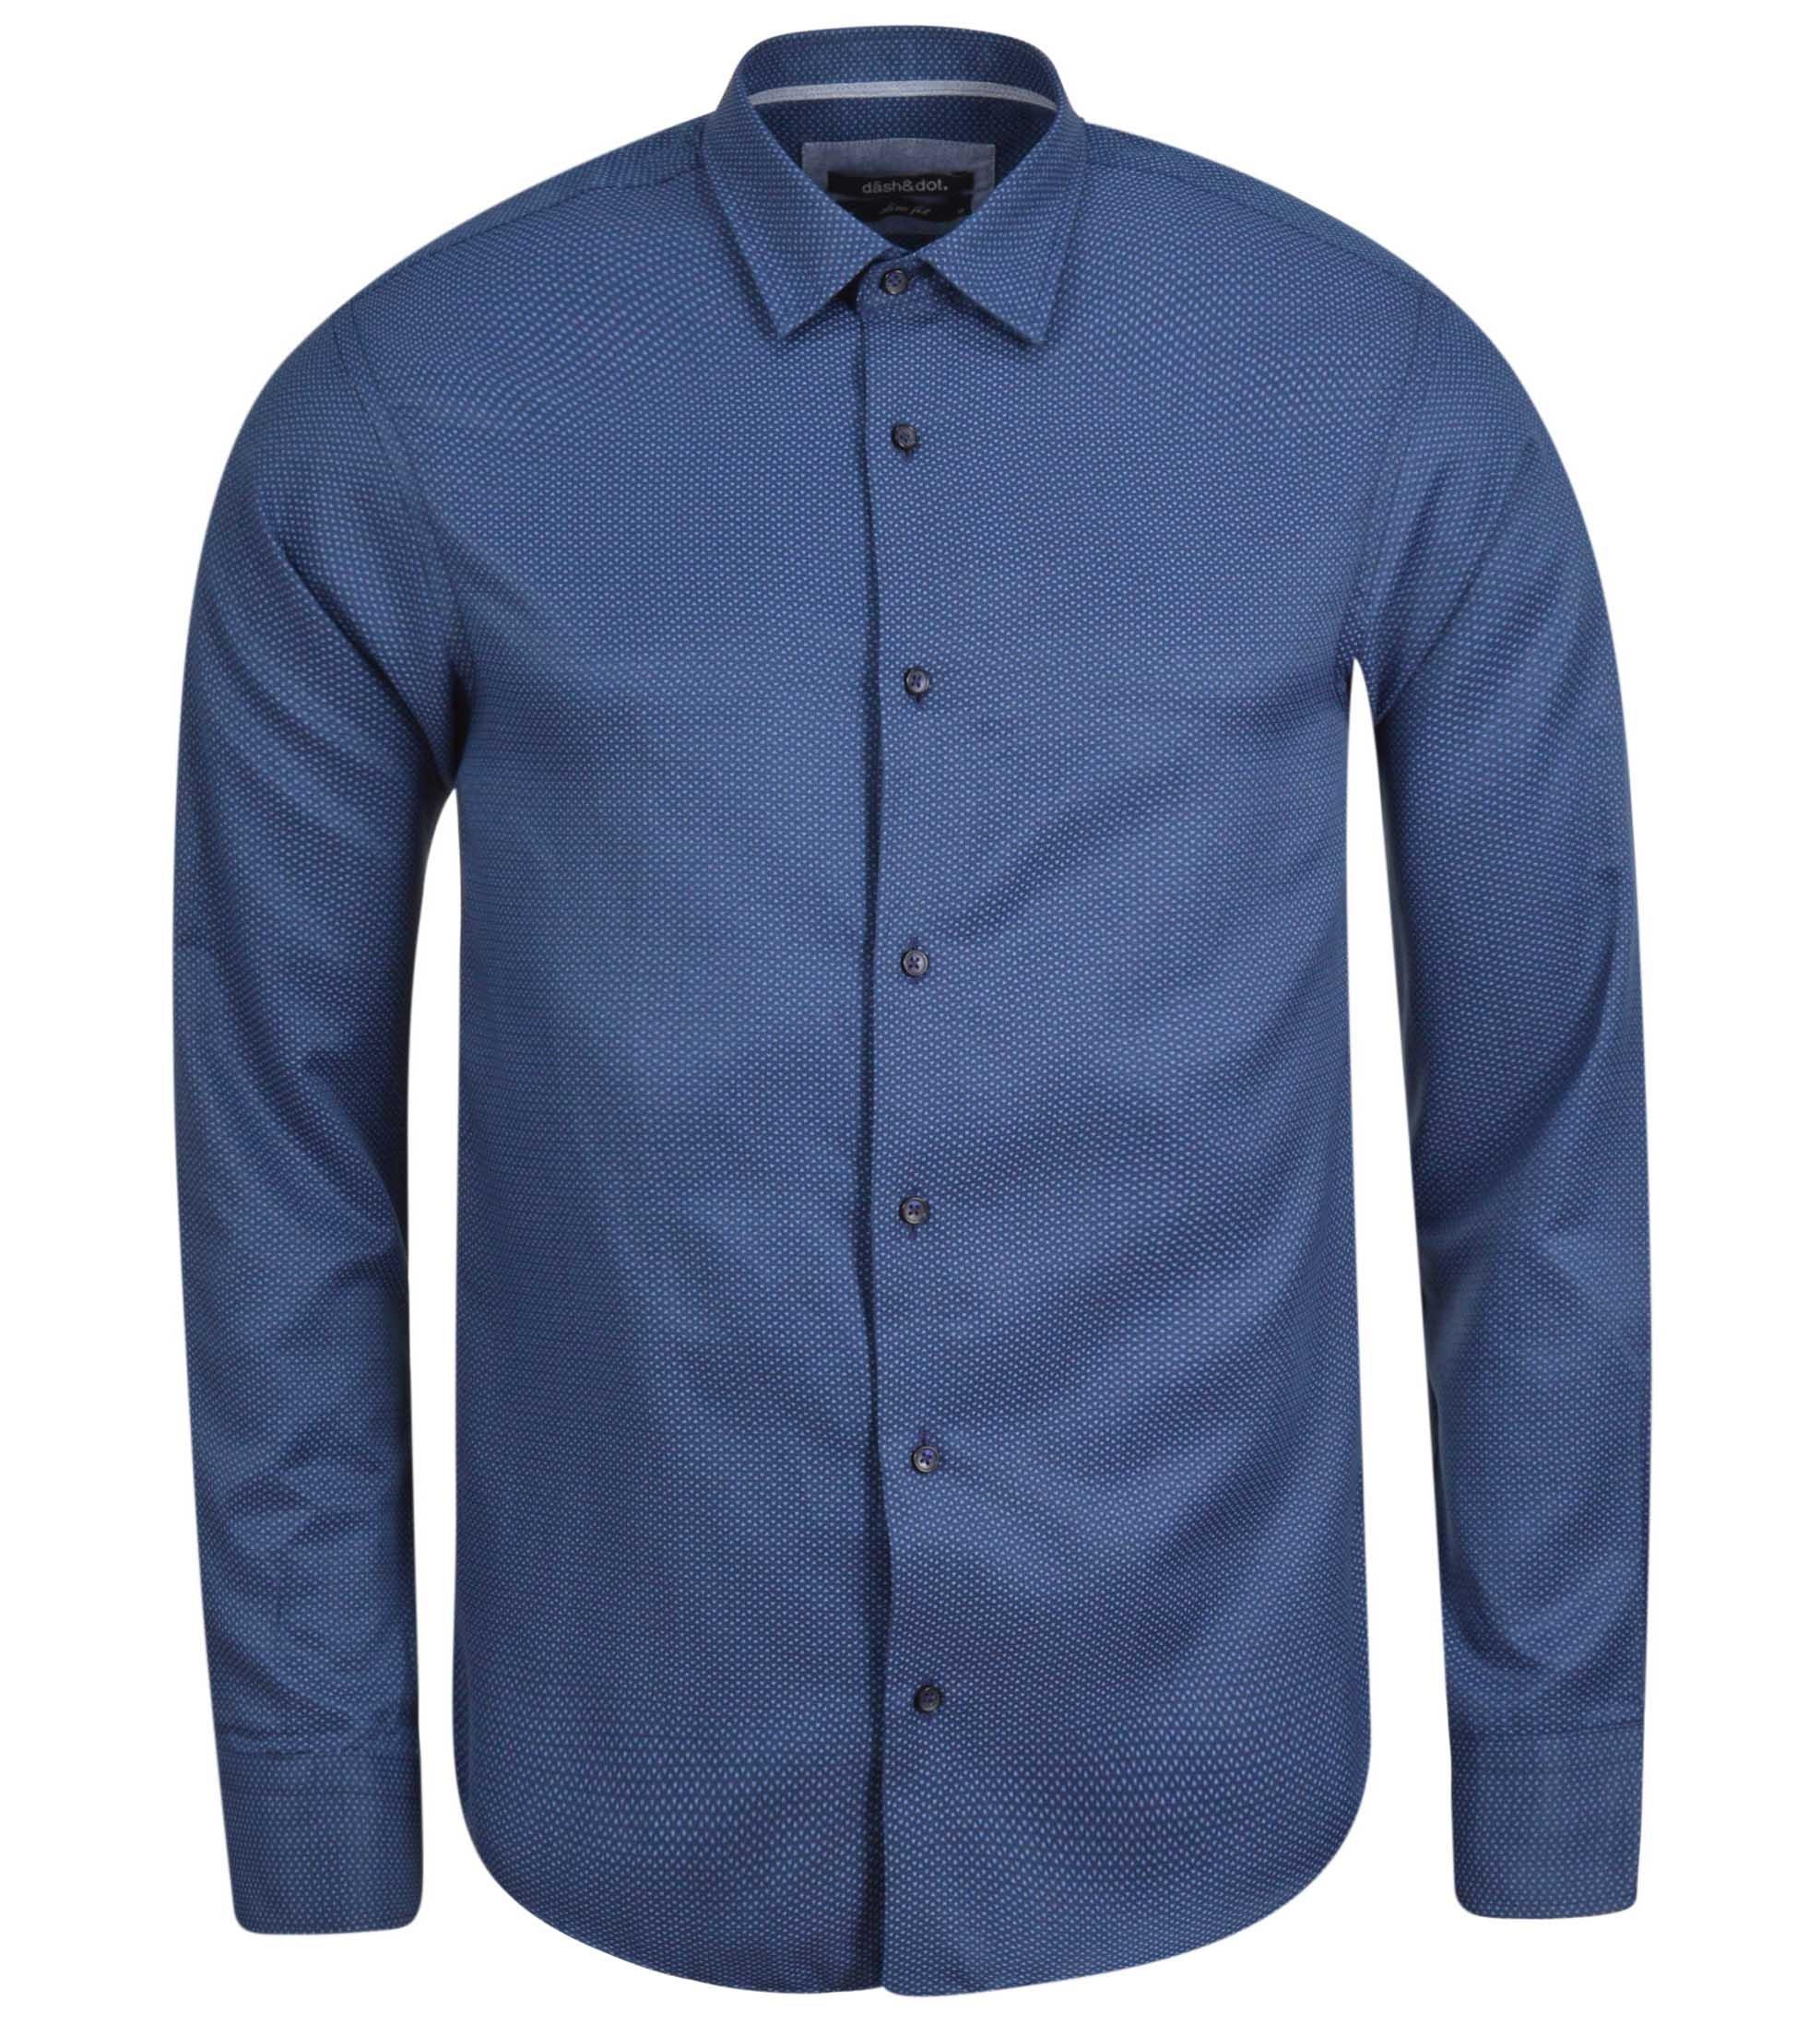 1c655a02d5d9 Ανδρικό πουκάμισο Dash Dot 08404-2 - Glami.gr